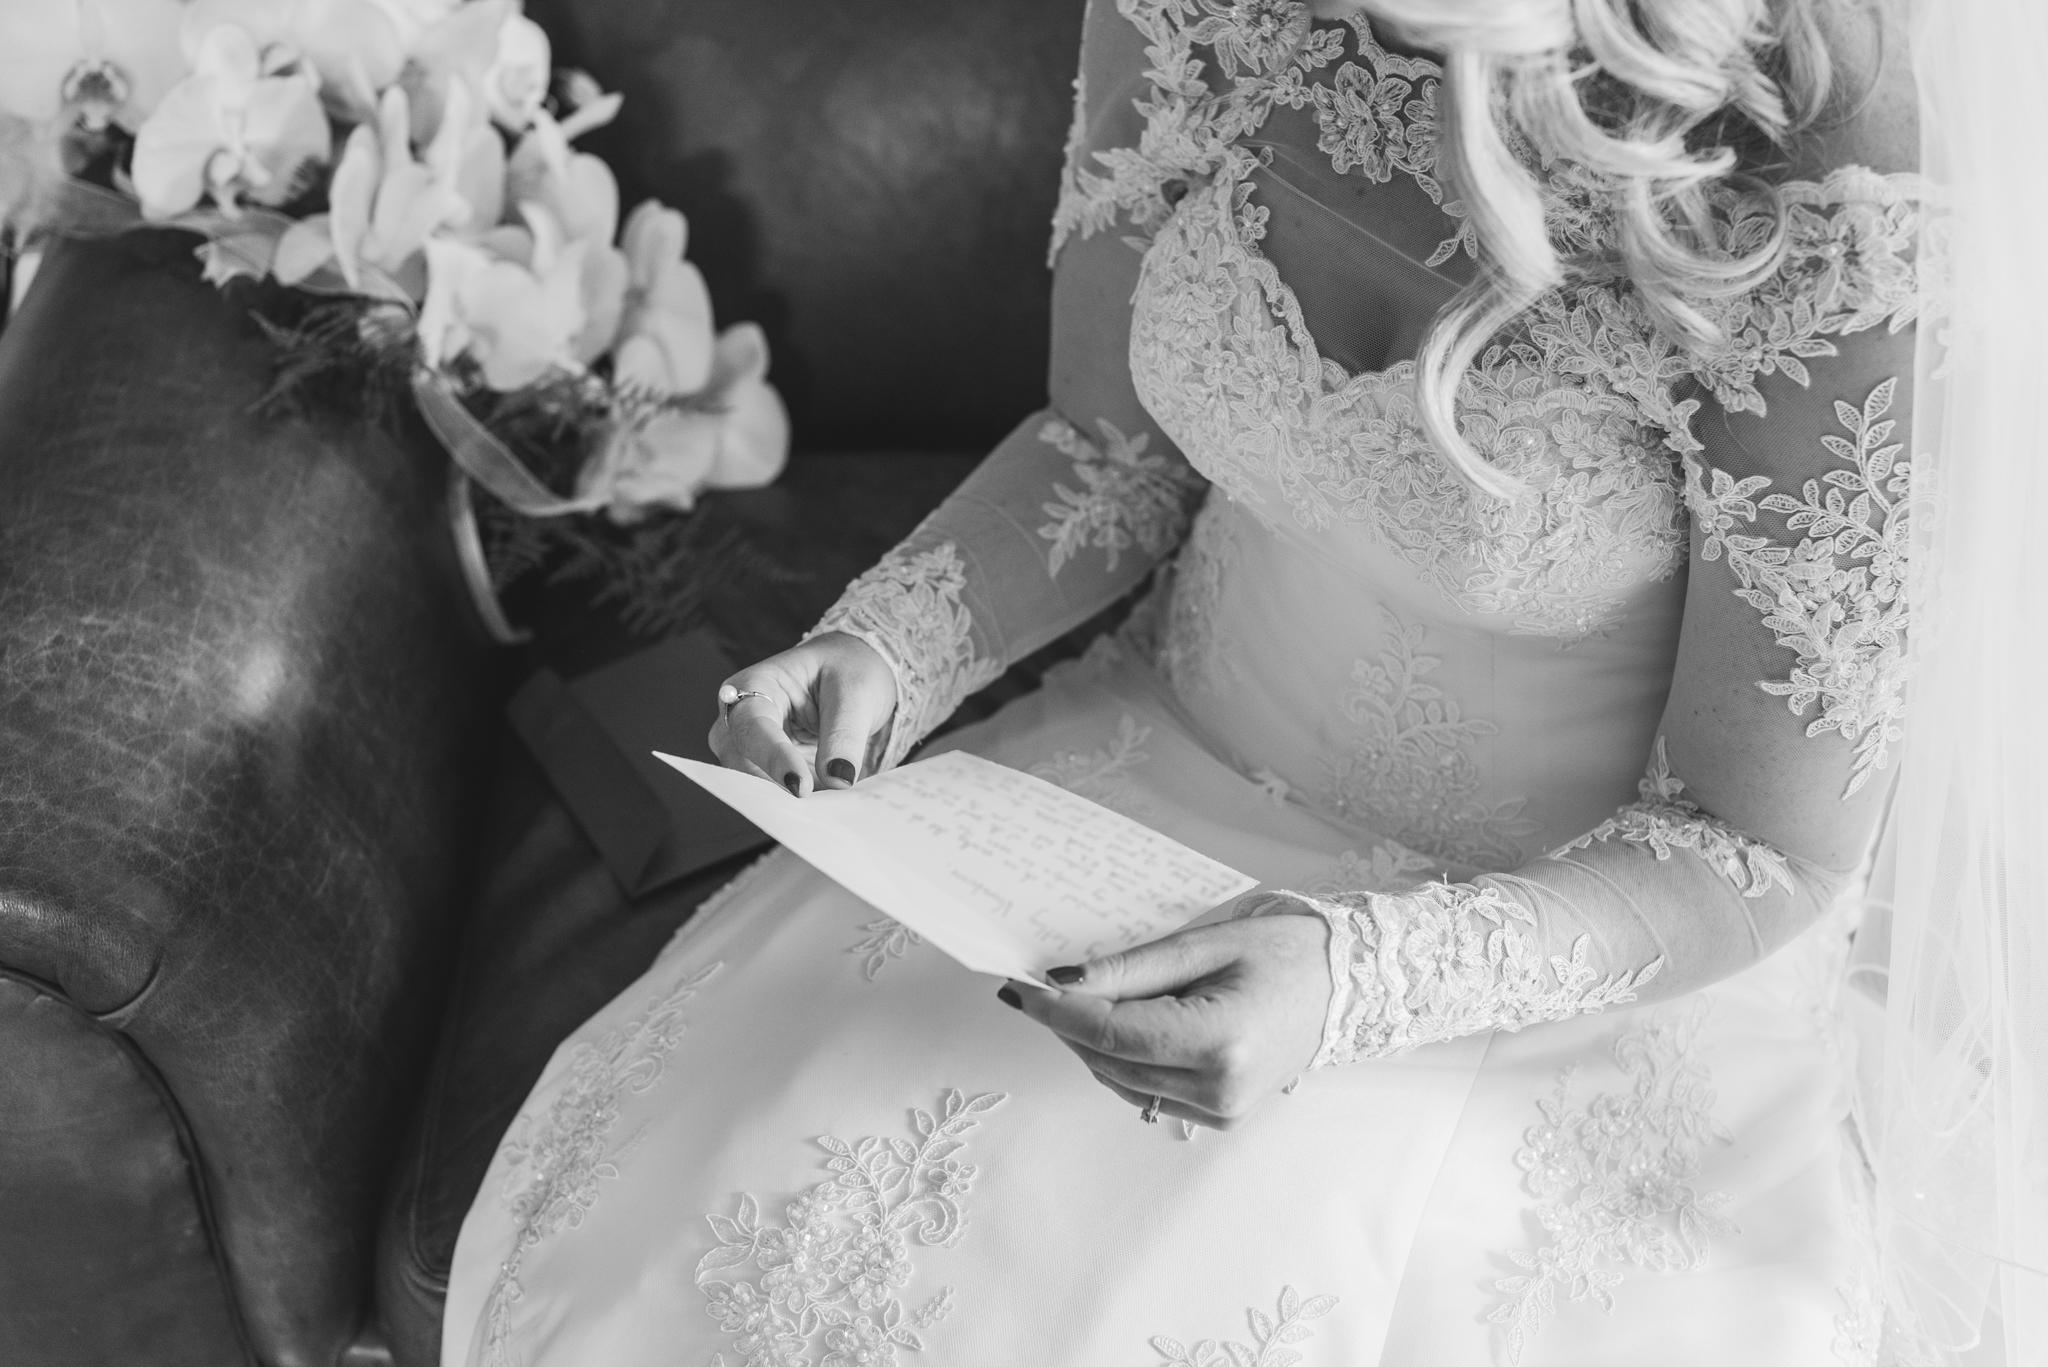 Angelique_Smith_Photography_Pieter&Yvonne_Wedding-205.jpg